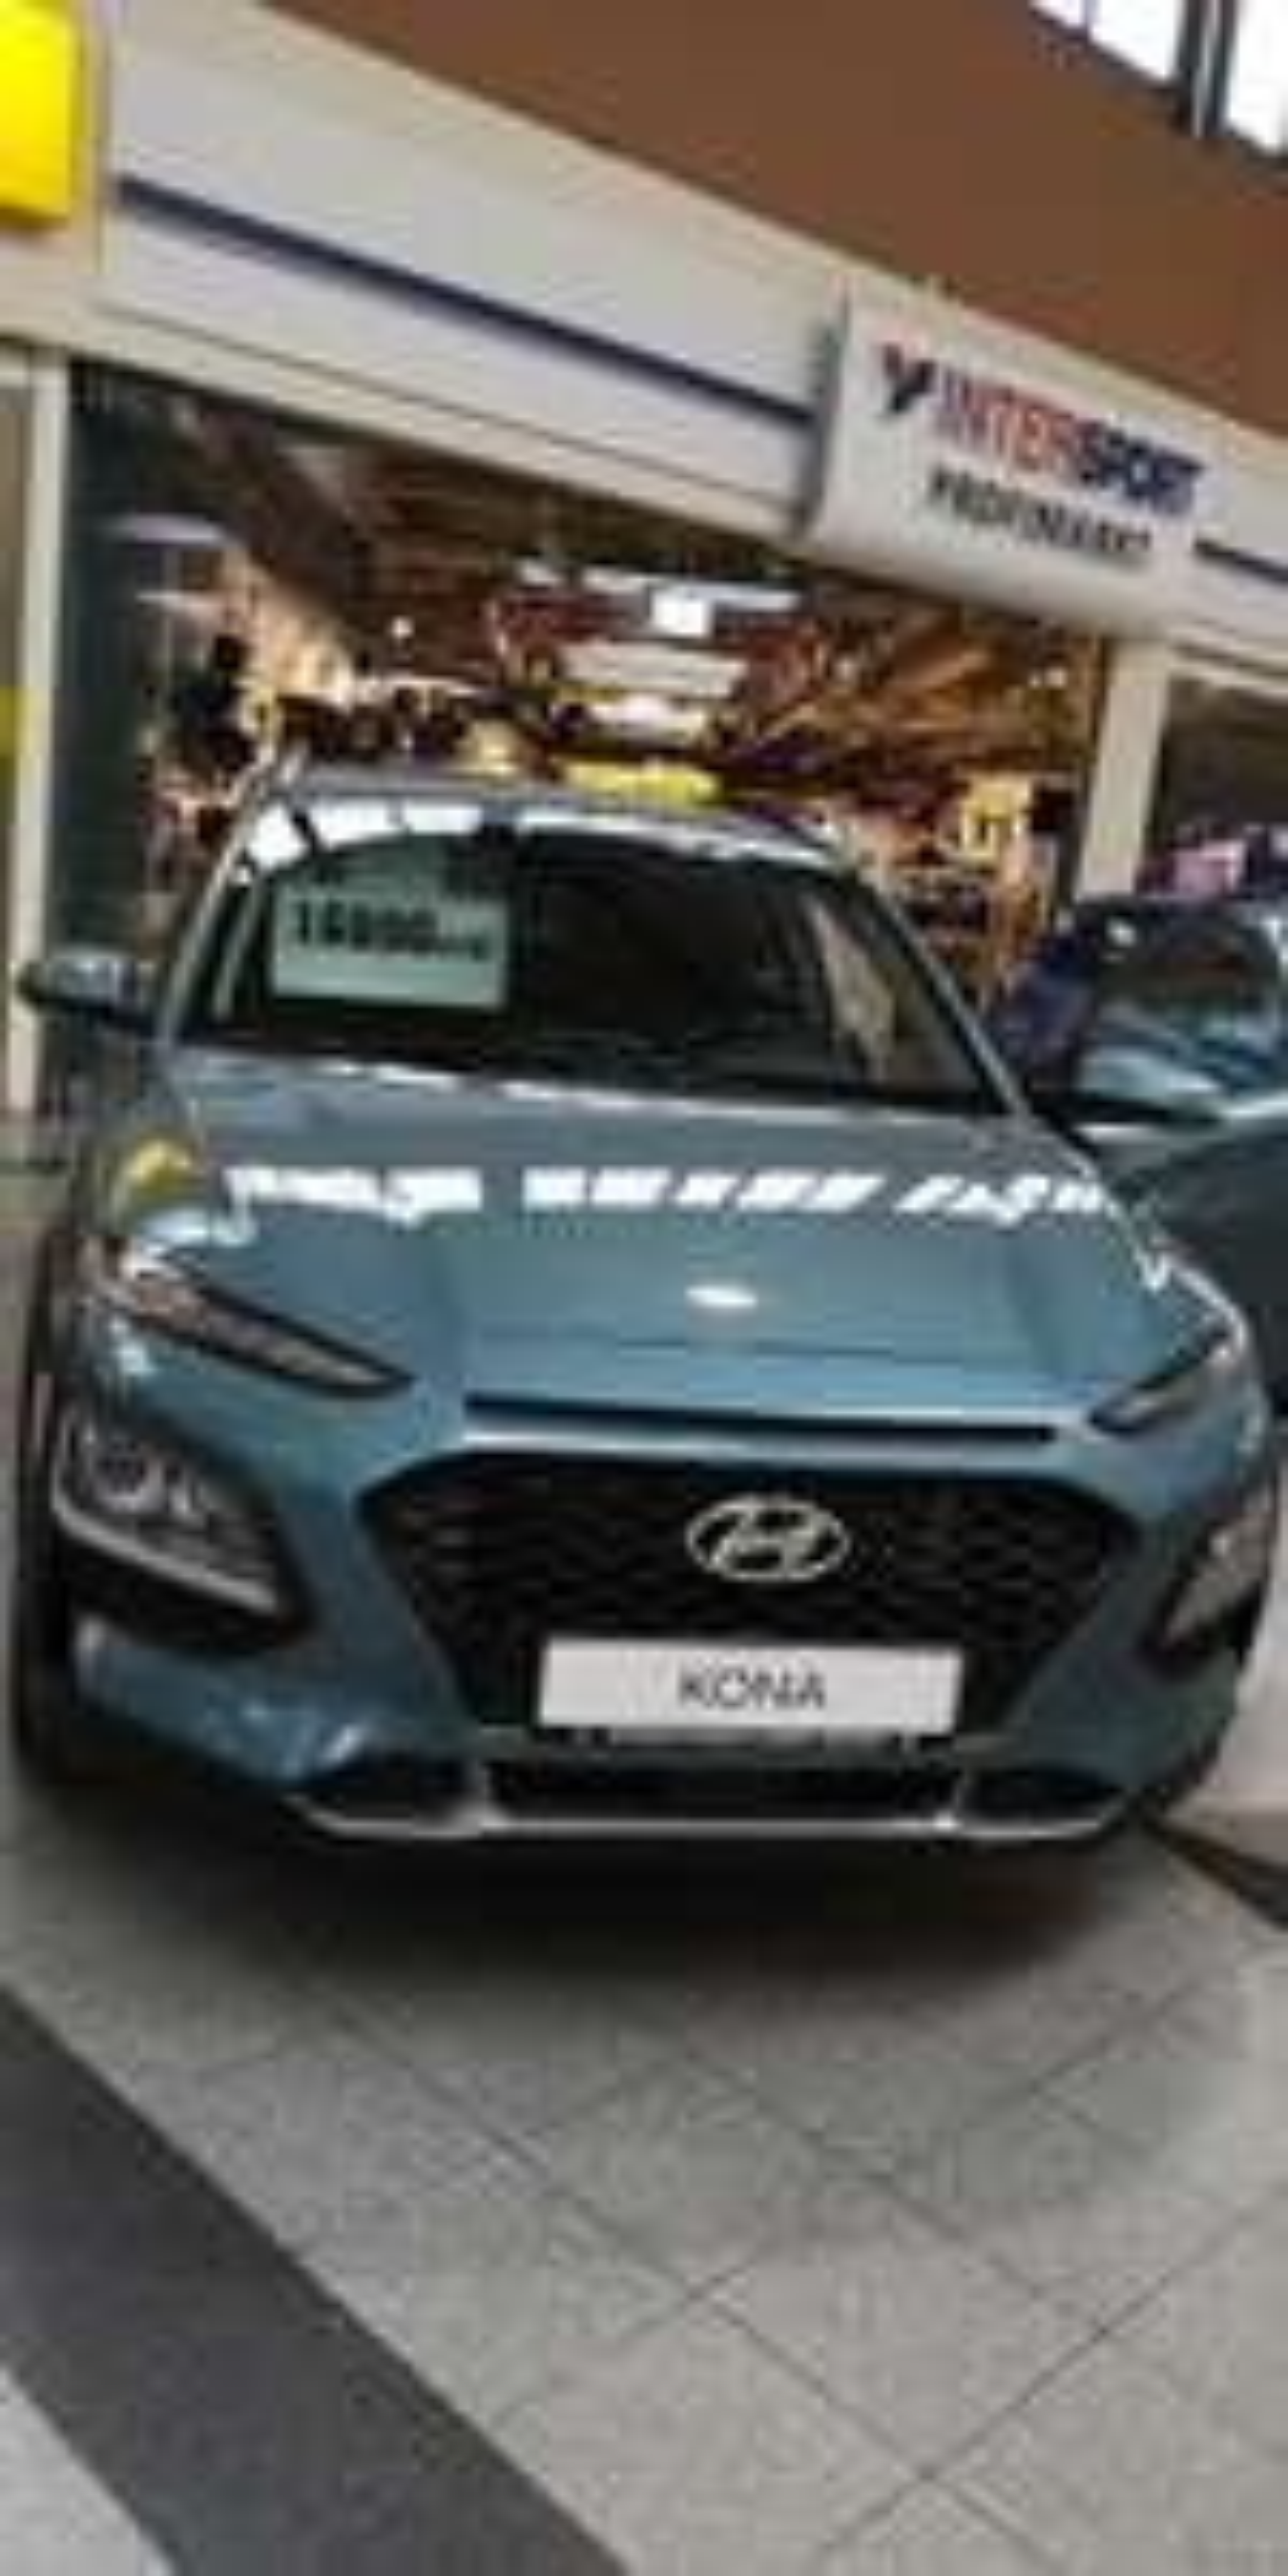 Lokal Rostock, Hyundai Kona Select viel Ausstattung.